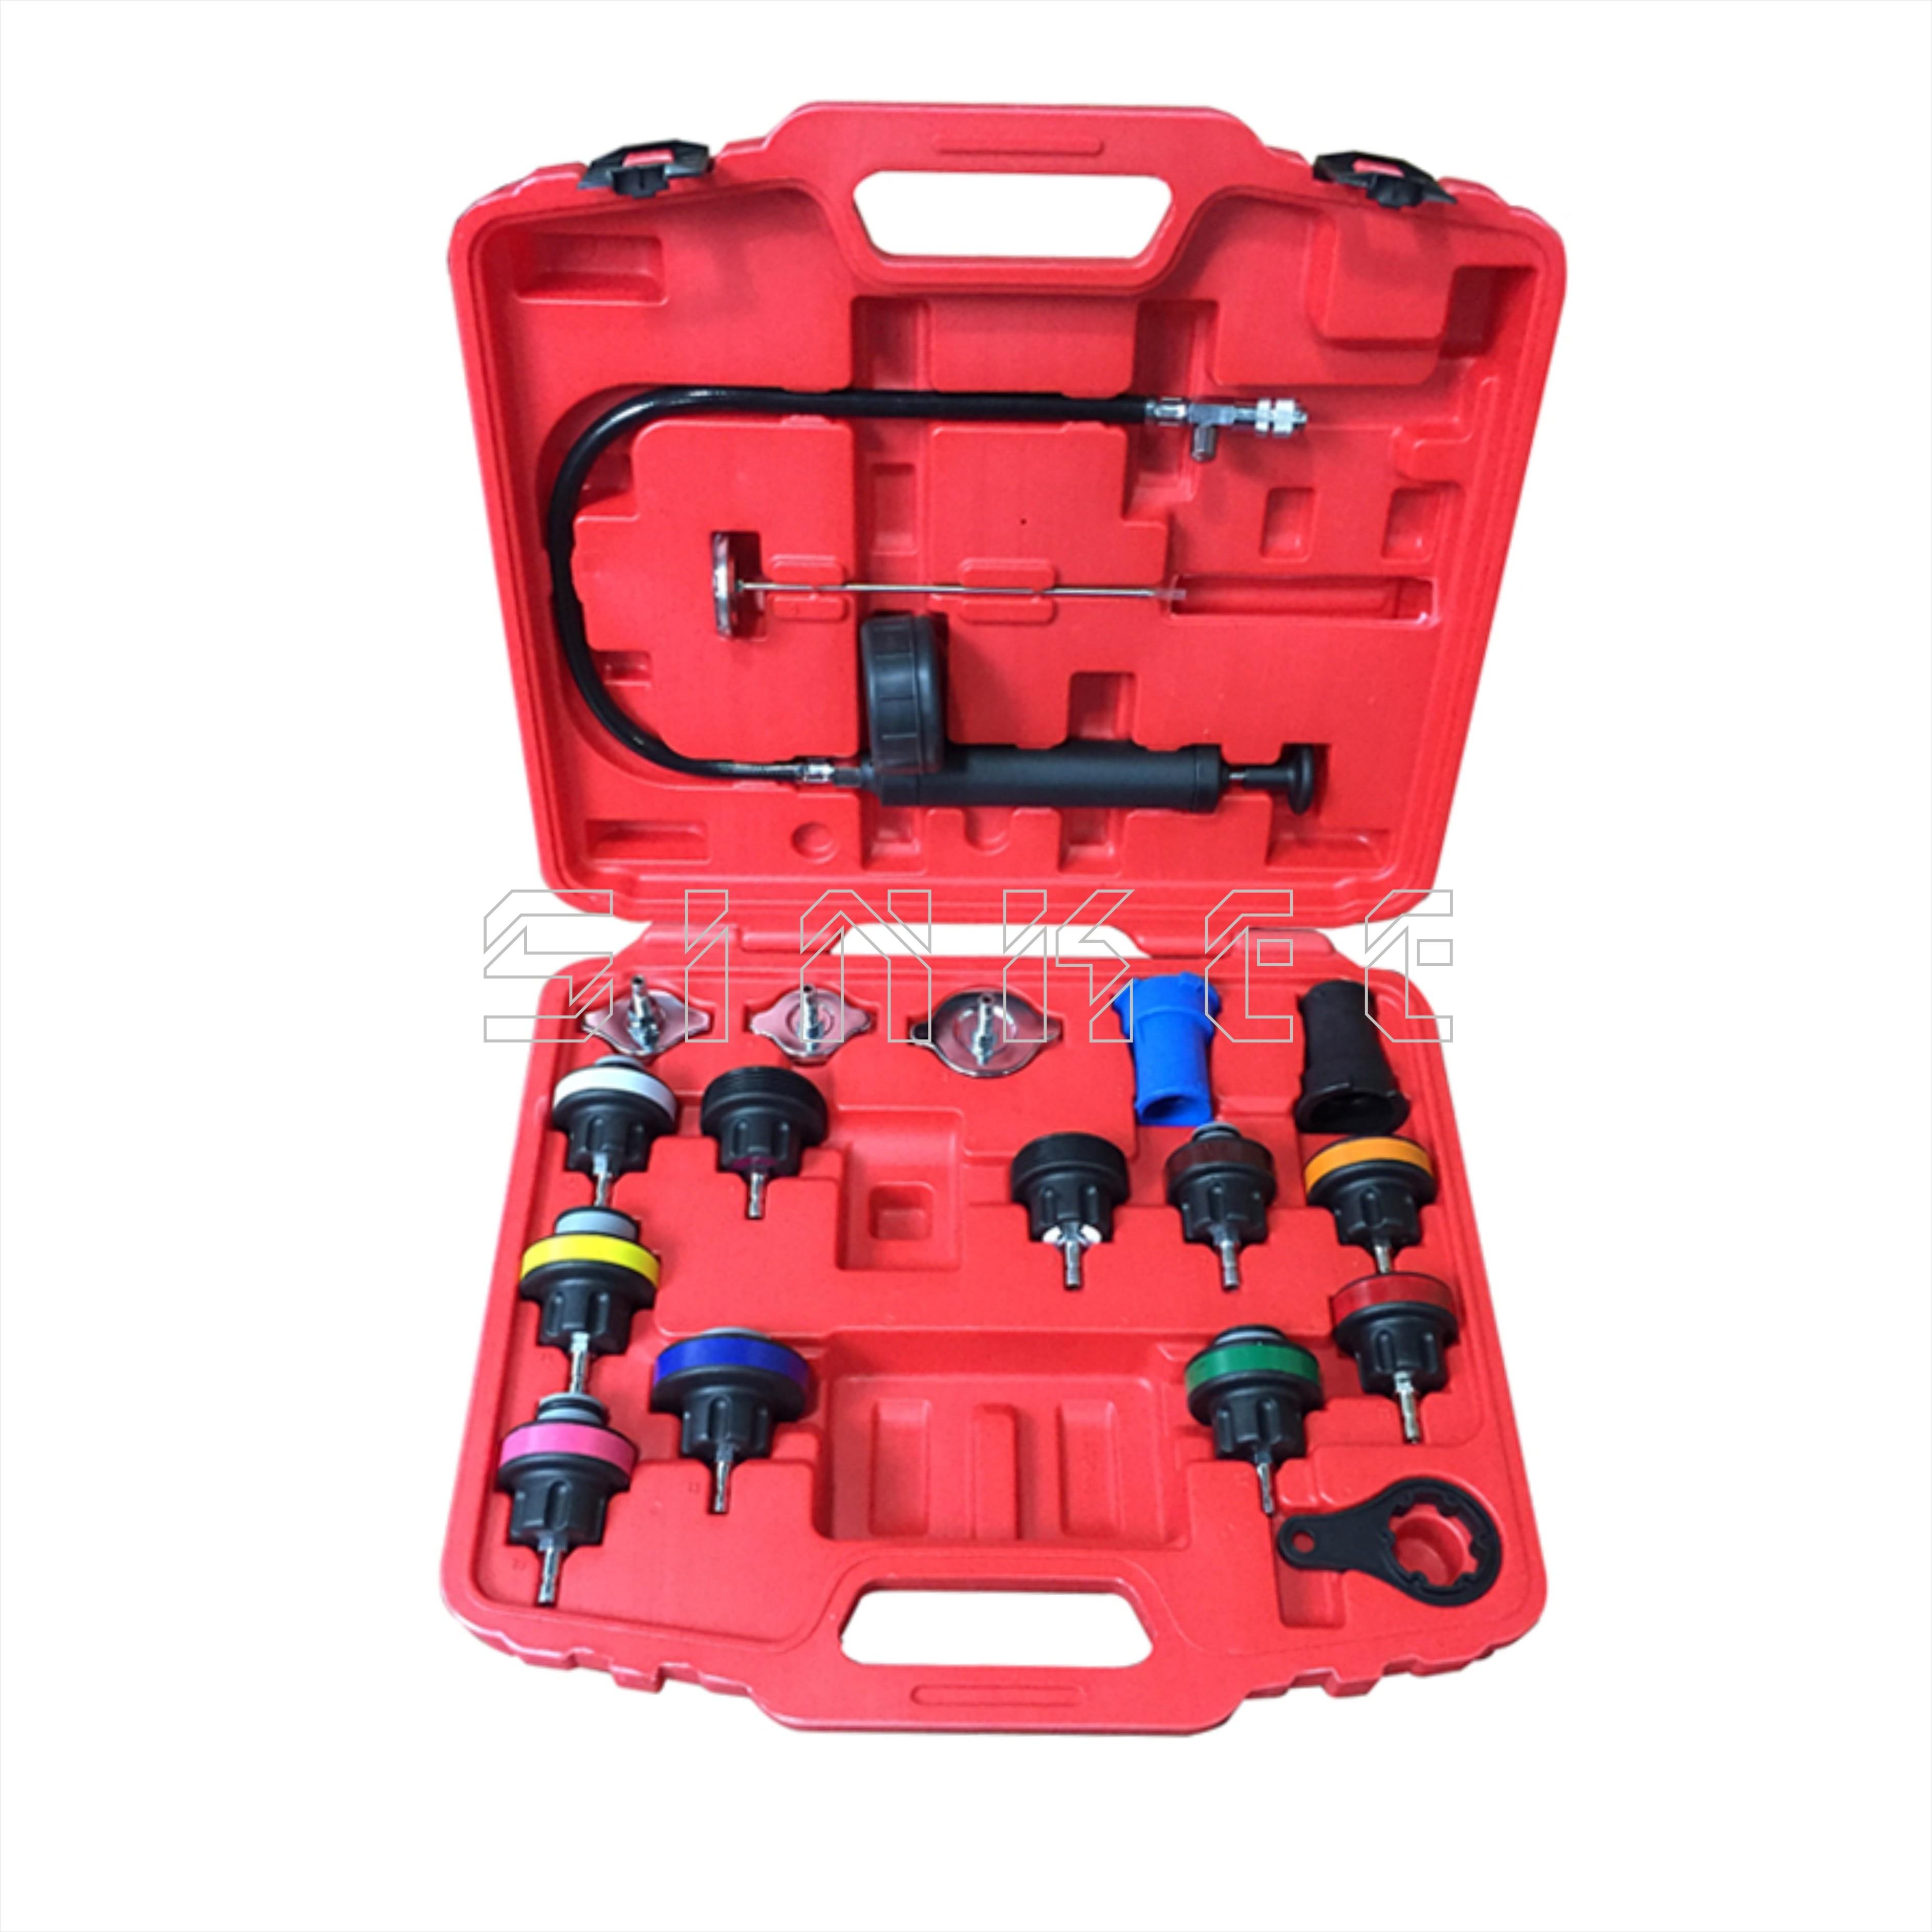 18 Pcs Radiator Pressure Tester Tool Kit Cooling System Testing Tool Vacuum Vehicle Universal For VW